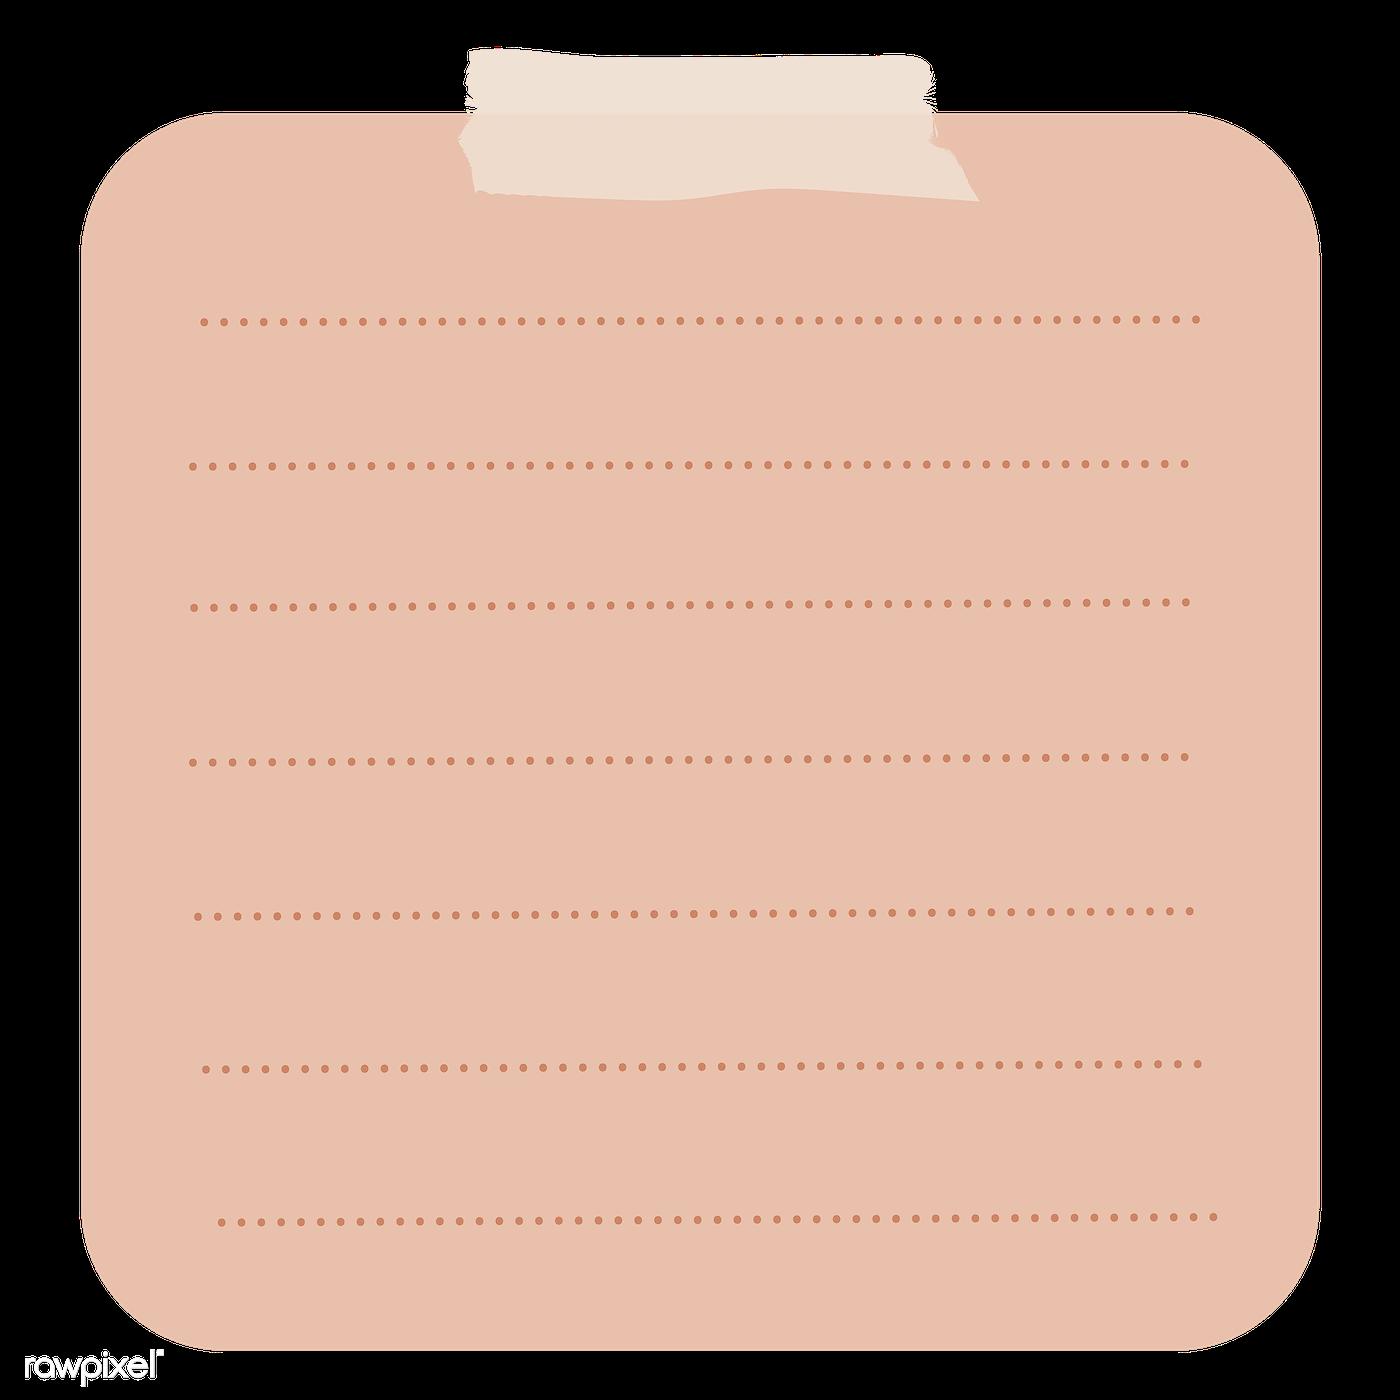 Transparent Background Blank Sticky Note Png - Laptopg